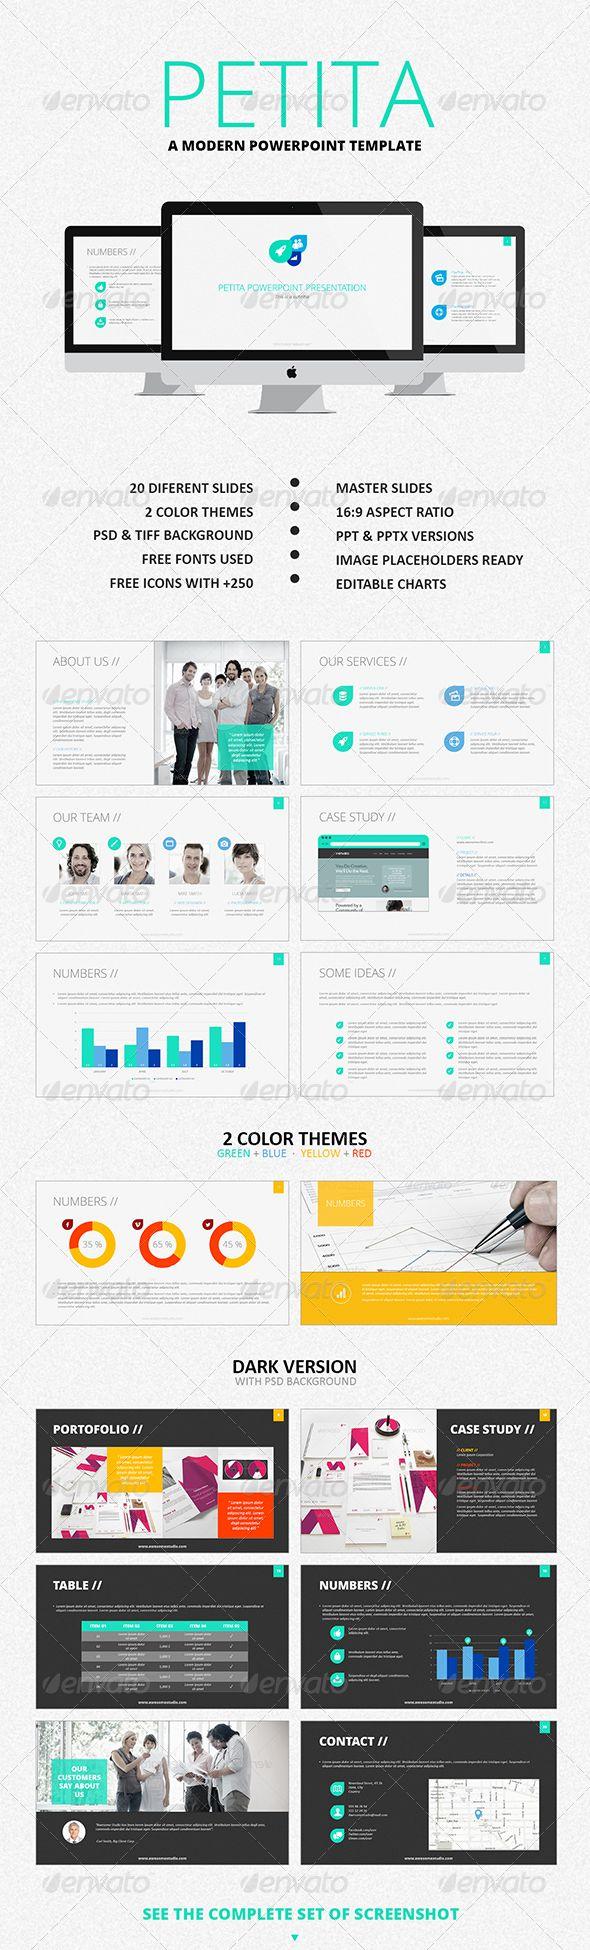 Petita PowerPoint Template - Powerpoint Templates Presentation Templates